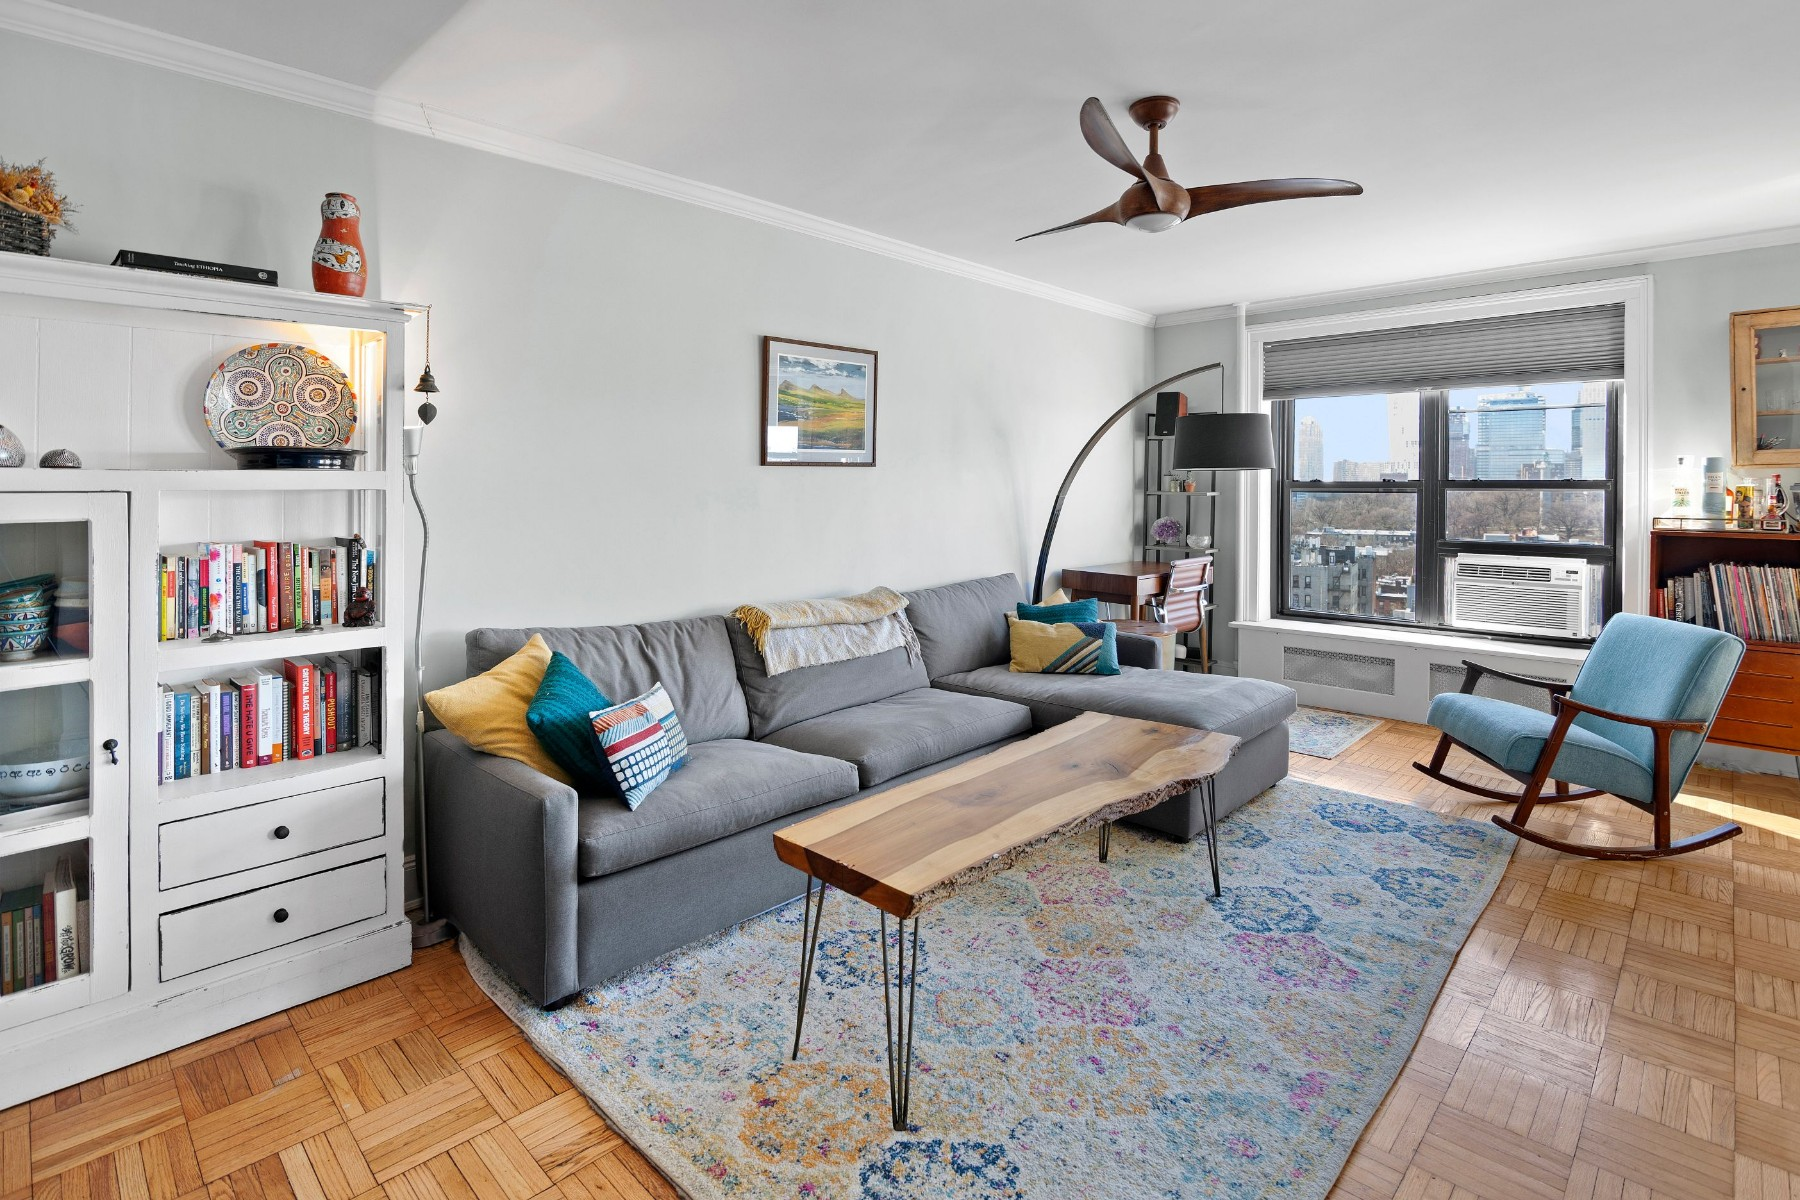 Apartment for sale at 201 Clinton Avenue, Apt 14B